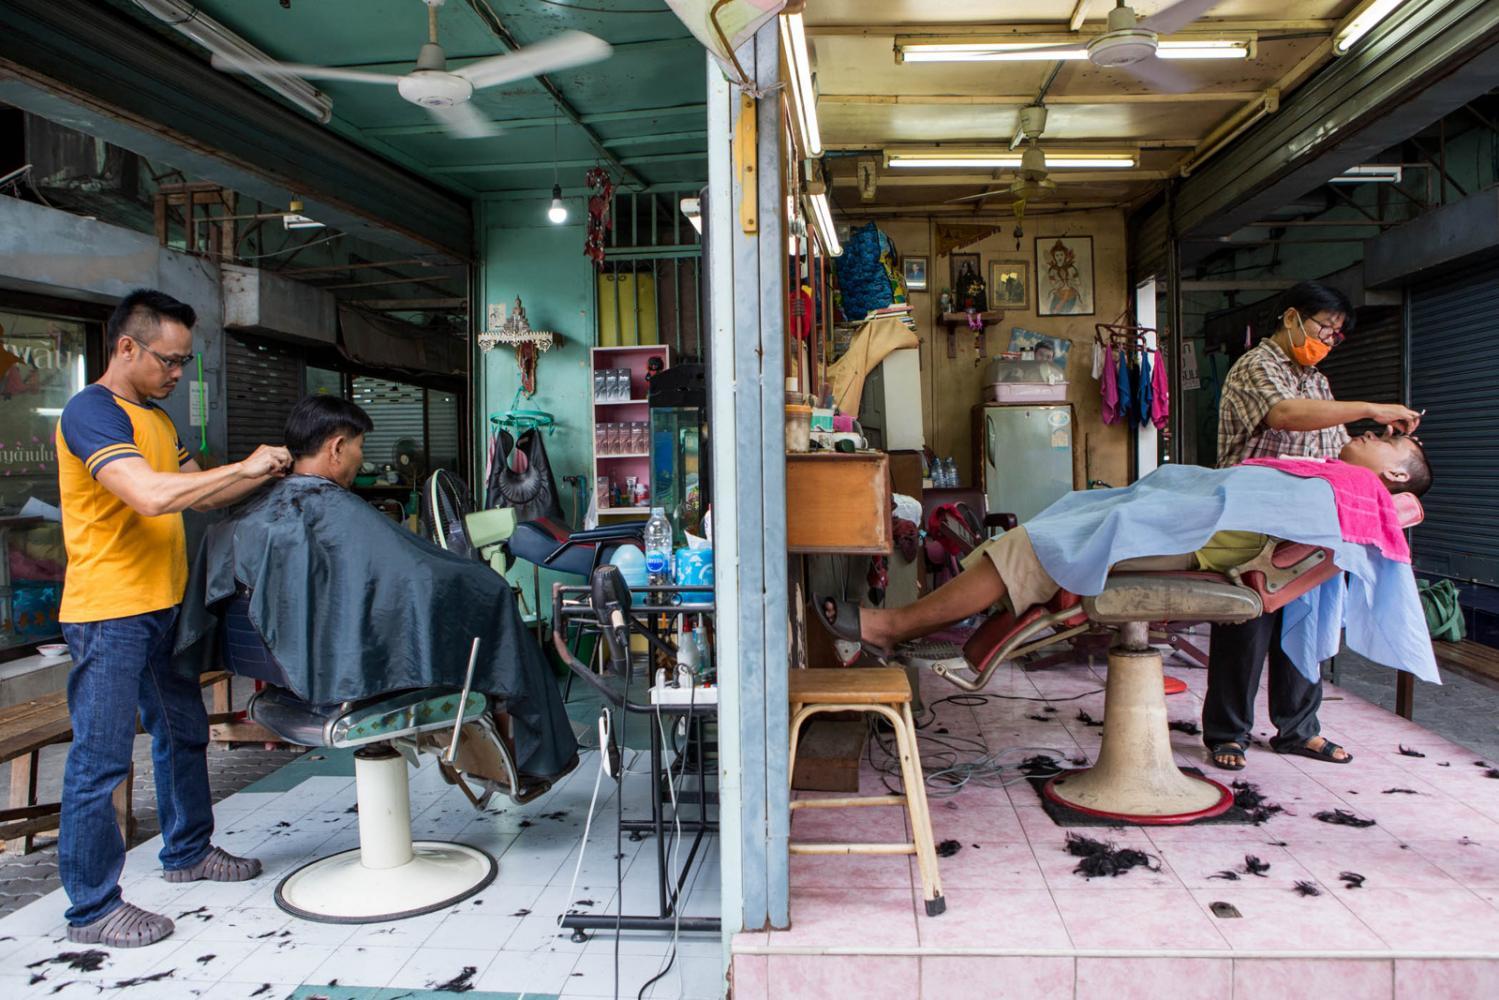 Barber shops under a bridge in Bangkok, Thailand